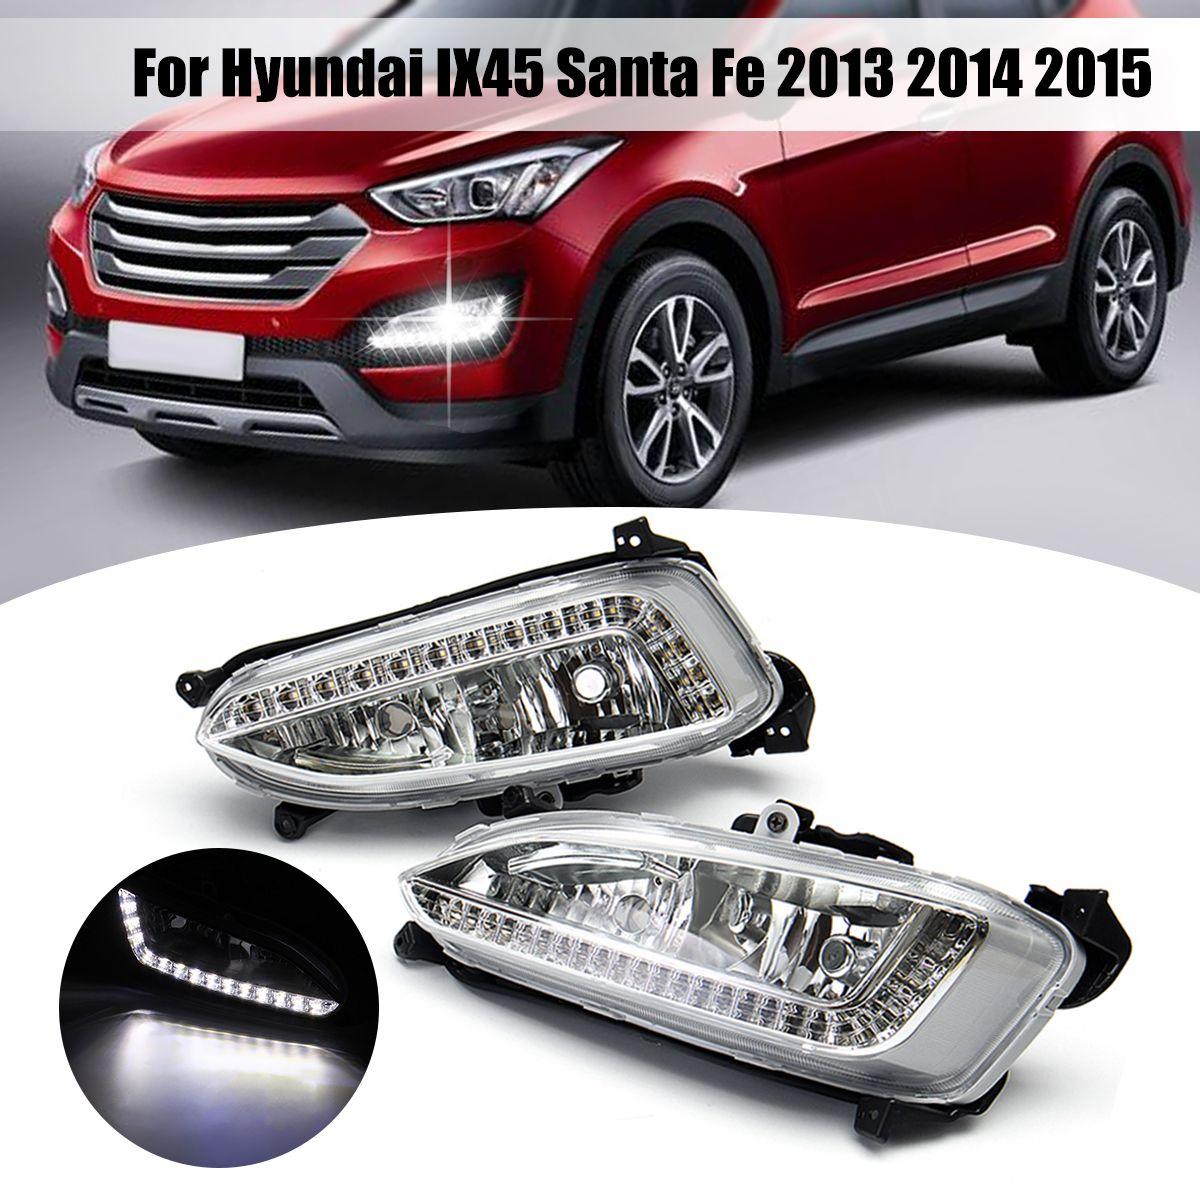 1 Pair 12V LED Car Fog Light Assembly for hyundai IX45 Santa Fe 2013 2014 2015 DRL Daytime Running Light Auto Accessories